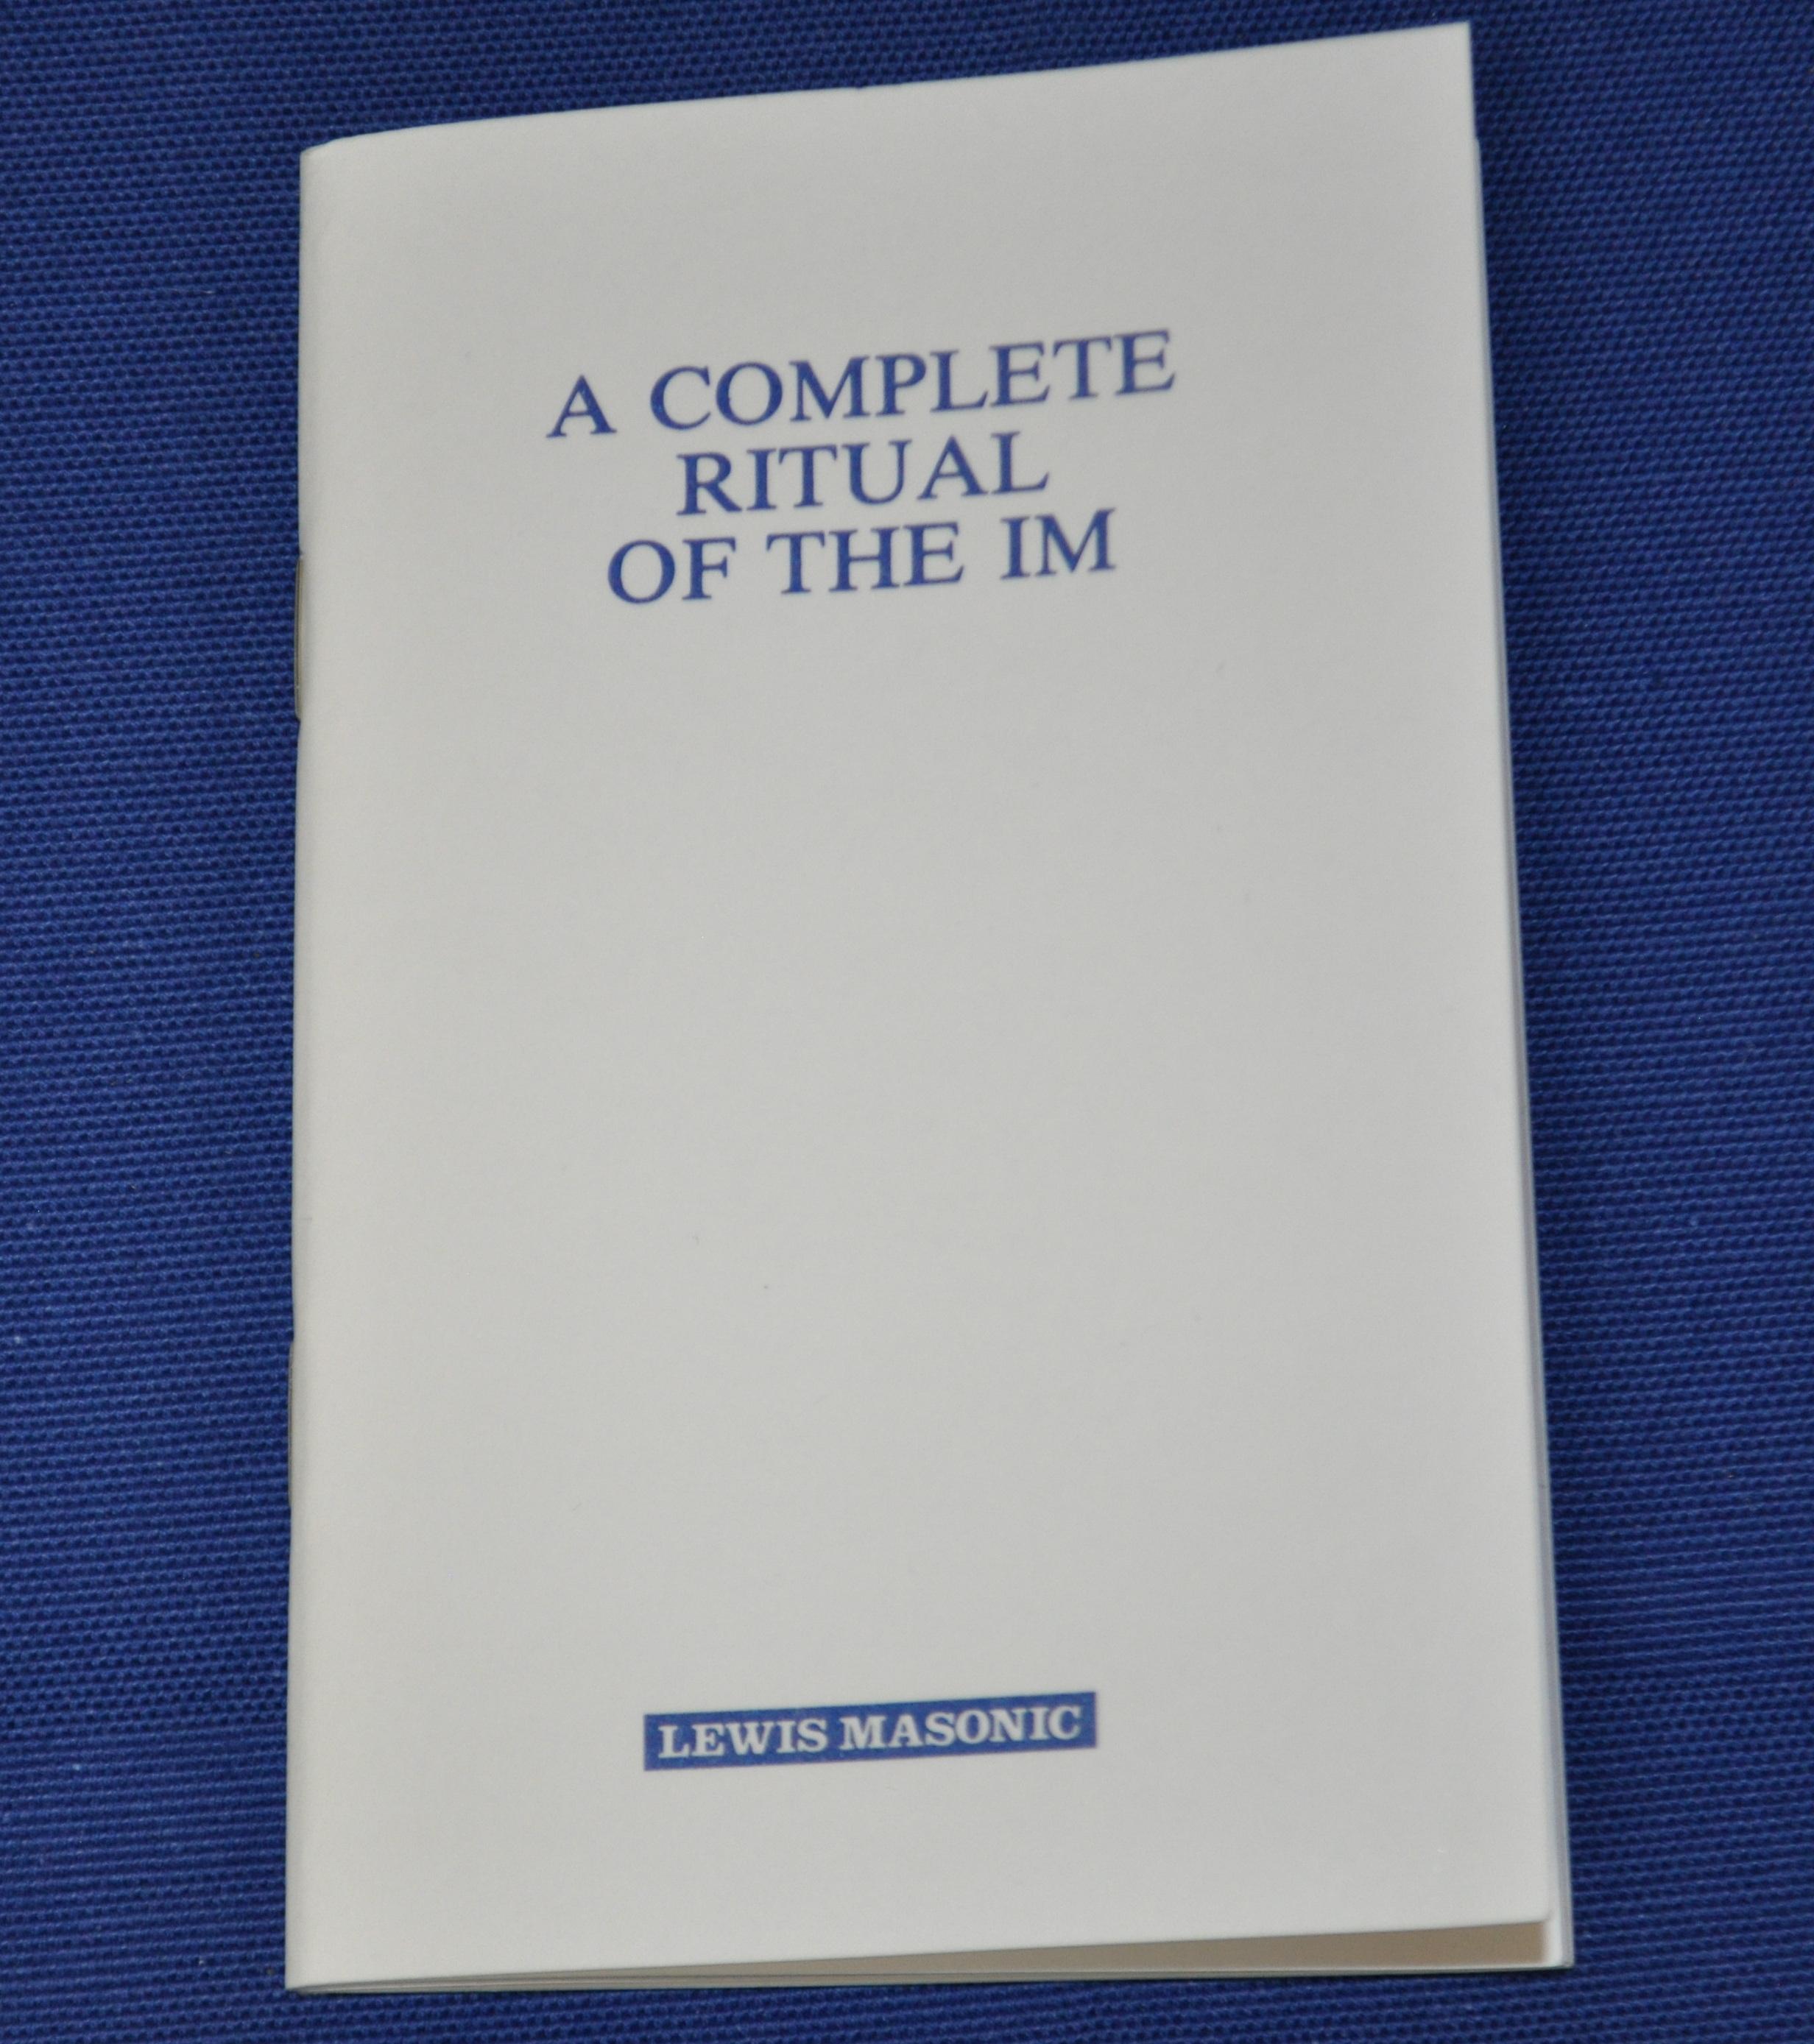 Craft Rituals / Books : Southern Regalia, Masonic Regalia